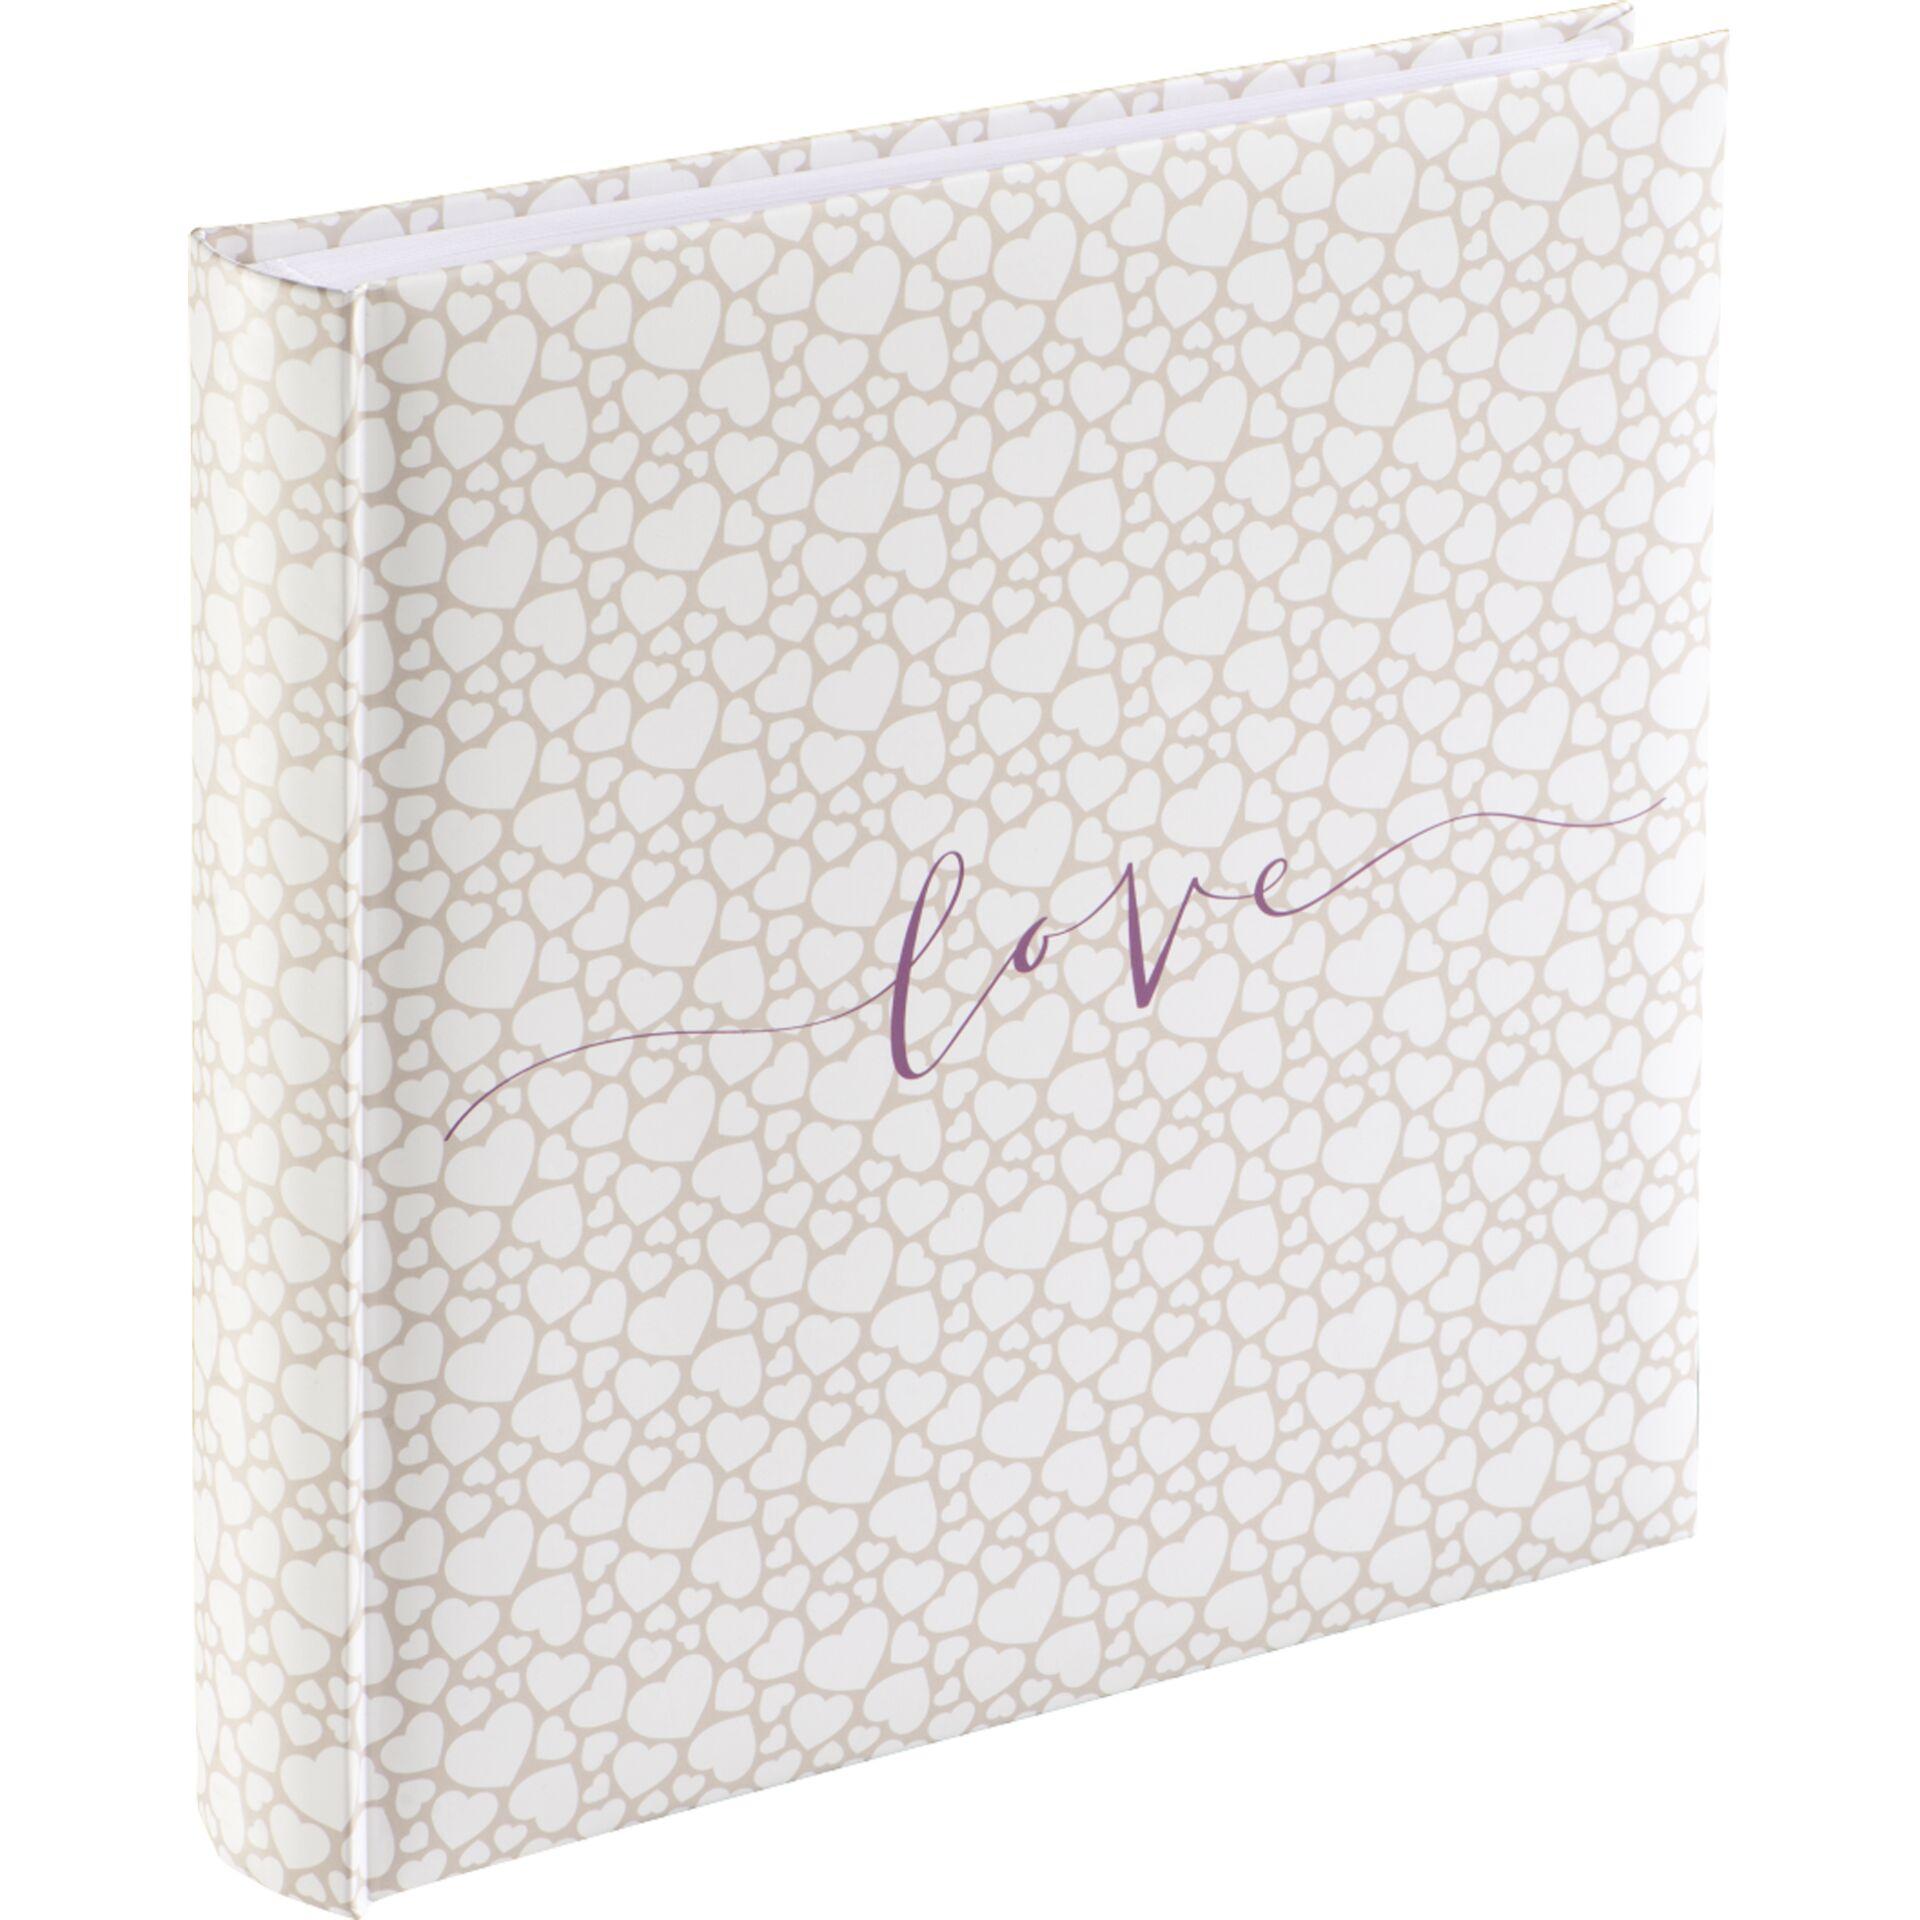 Hama Romance Wedding Jumbo 30x30 - 80 white pages